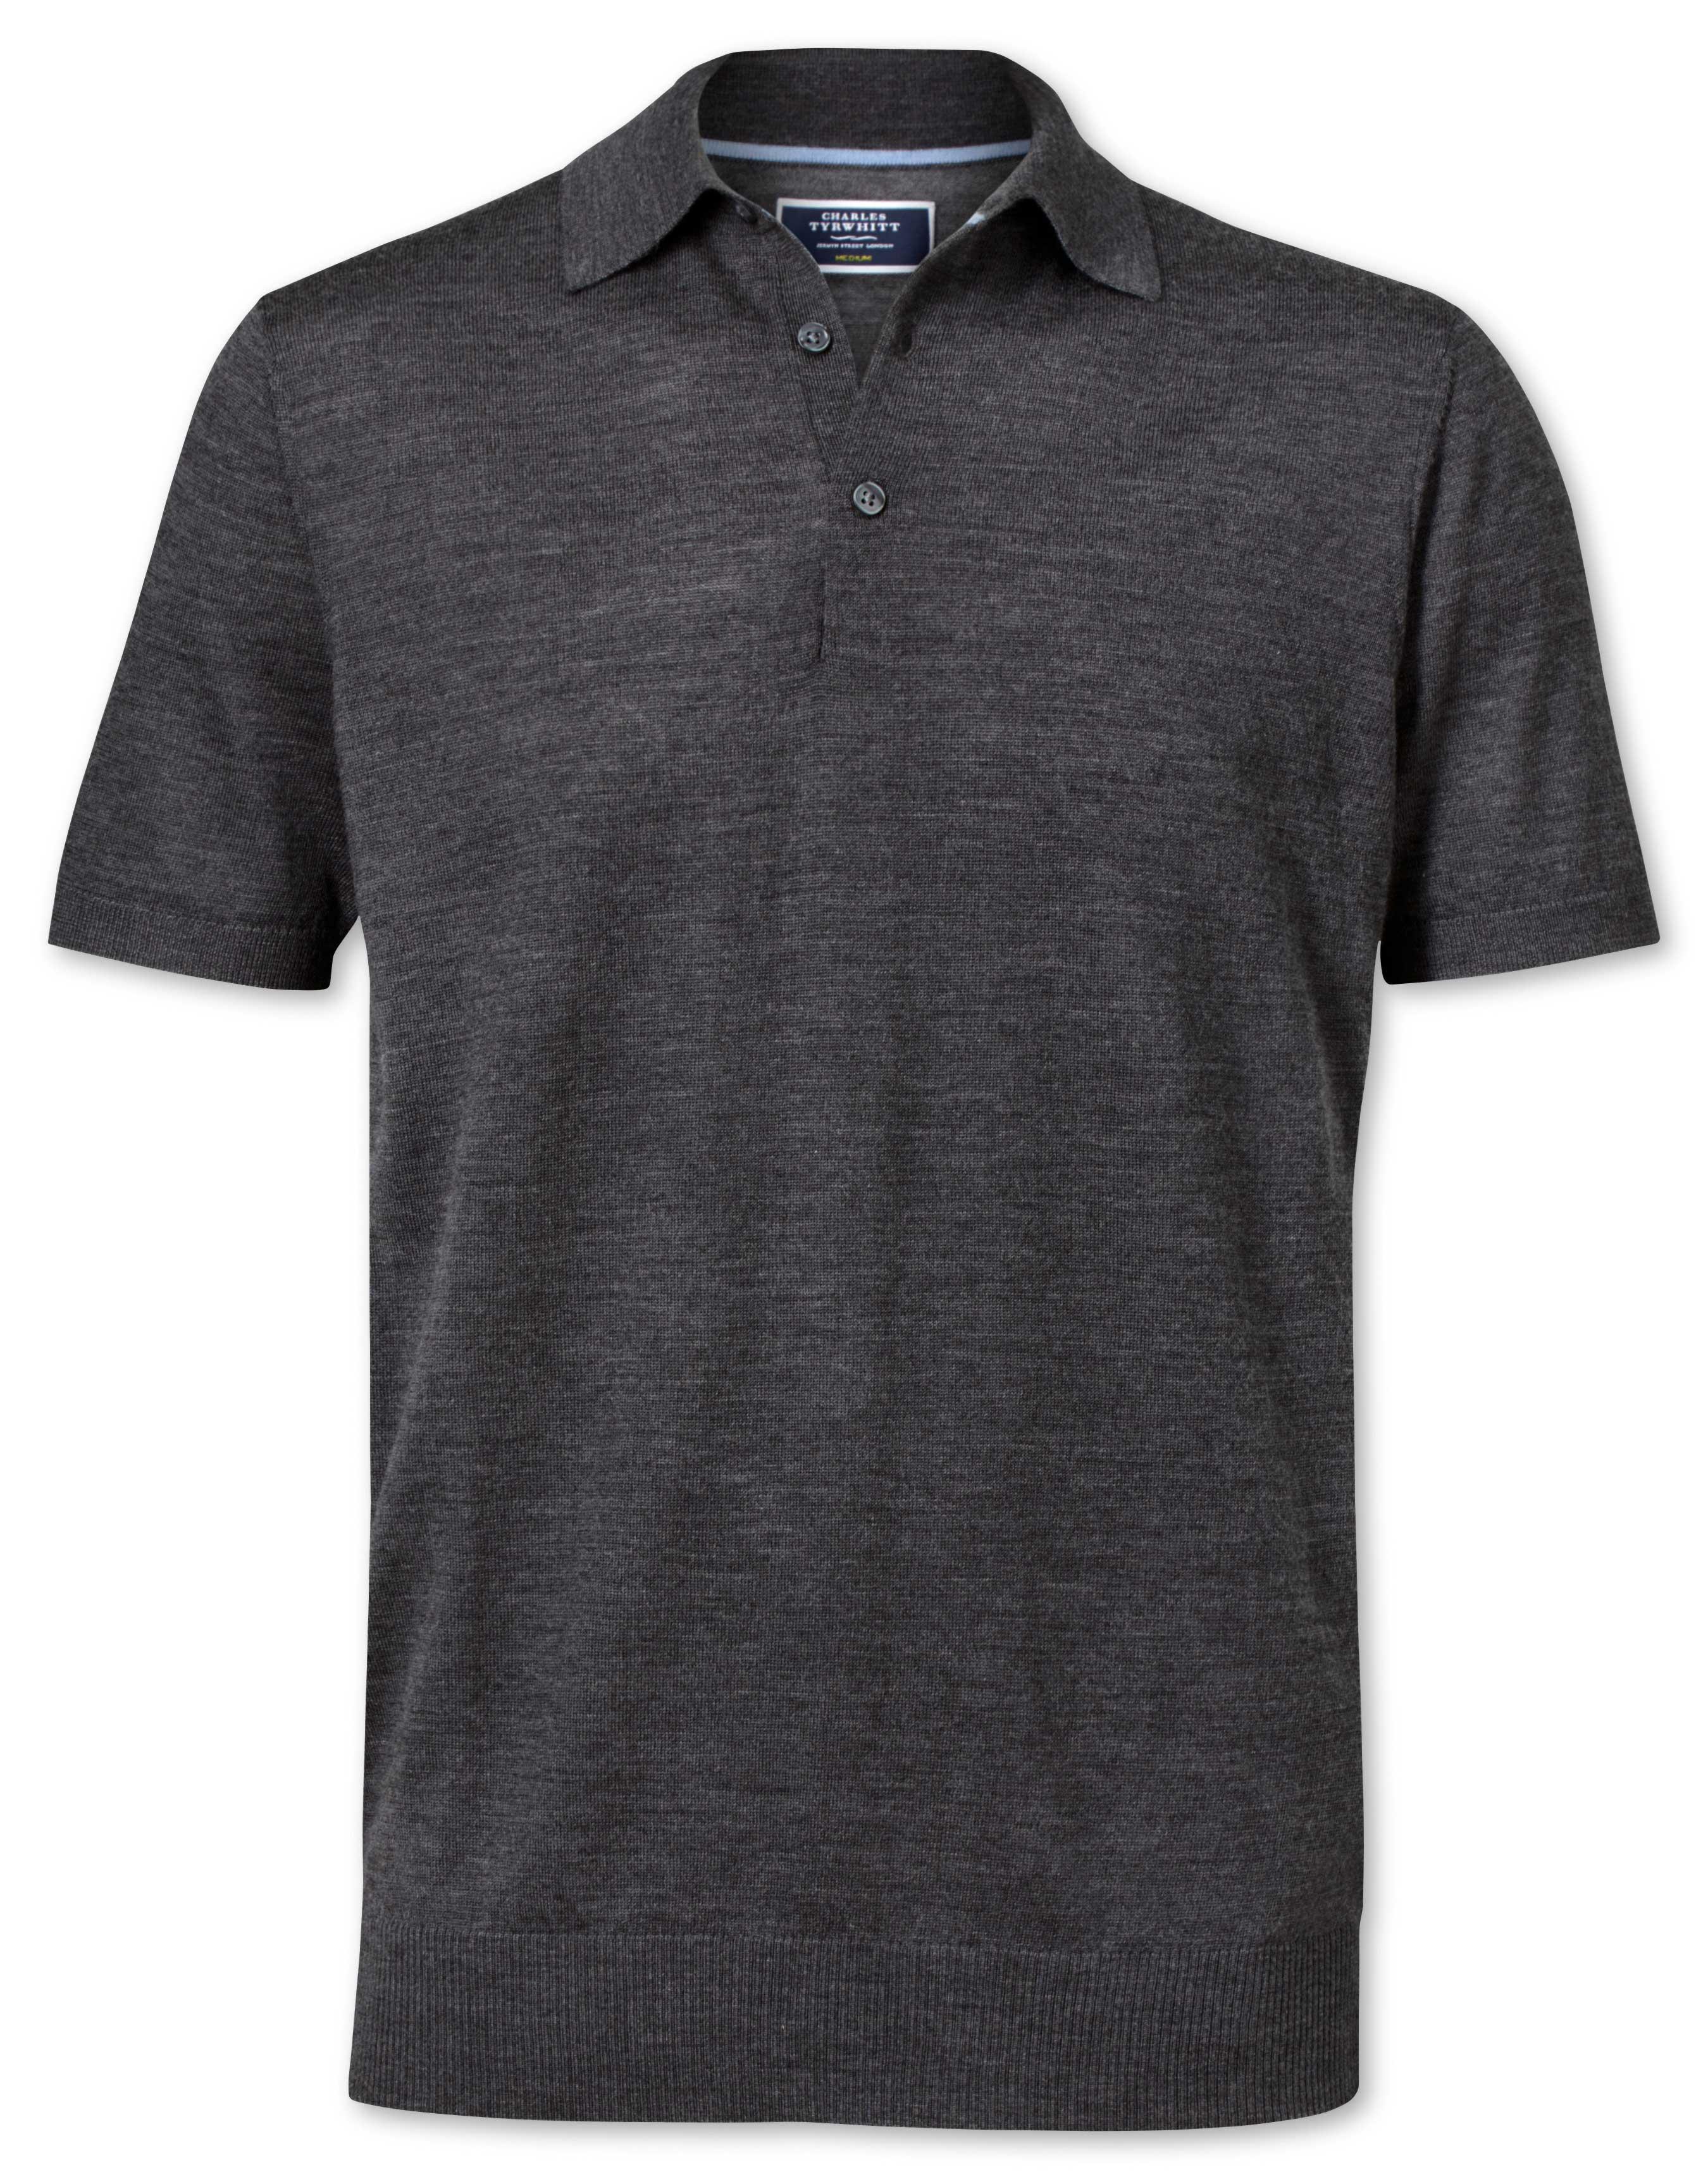 Charcoal Merino Wool Polo Collar Short Sleeve Jumper Size XS by Charles Tyrwhitt